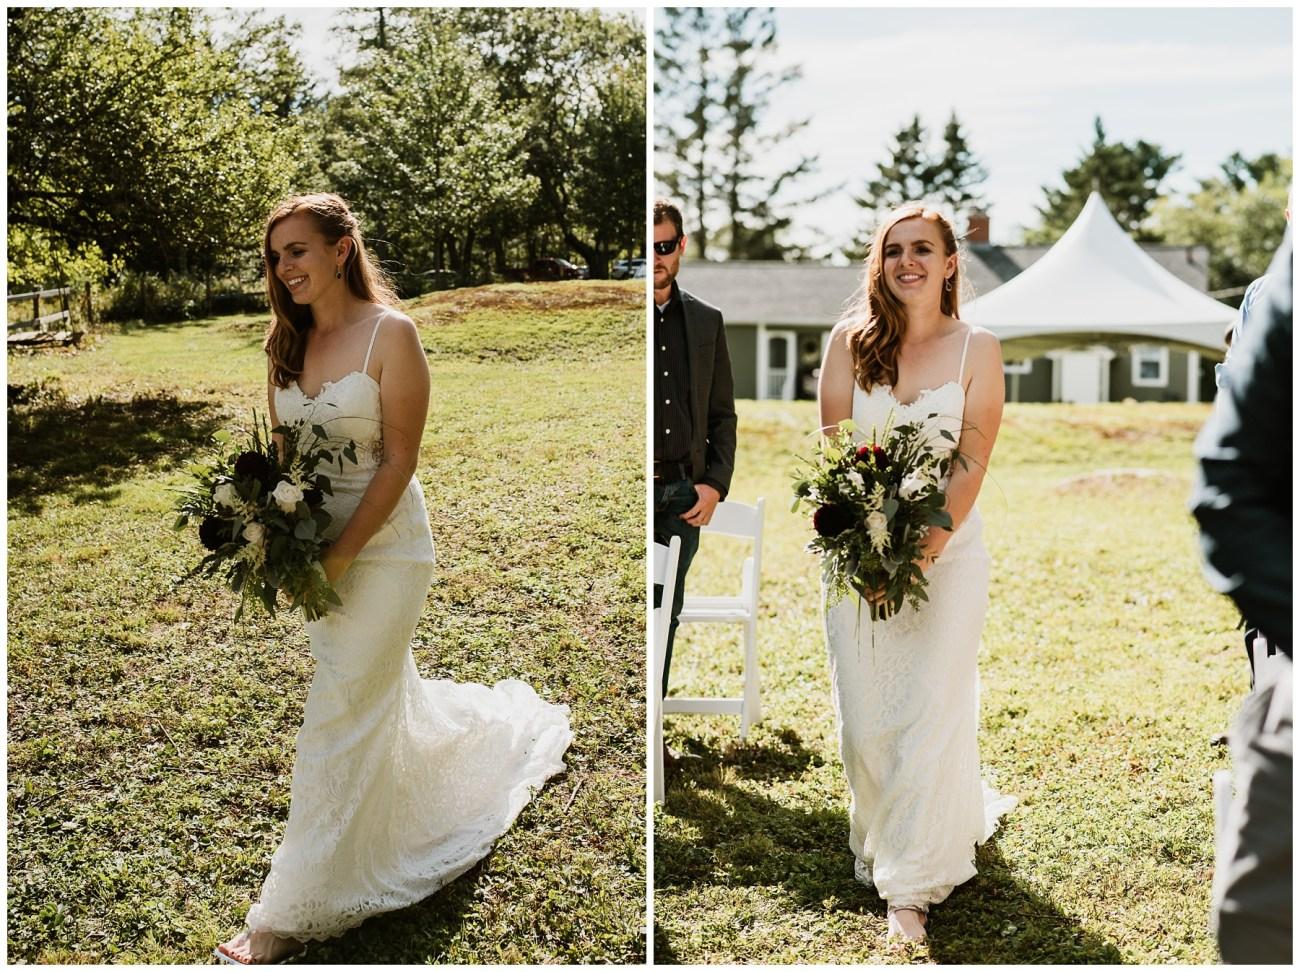 intimate-backyard-wedding-chester-nova-scotia_51.jpg